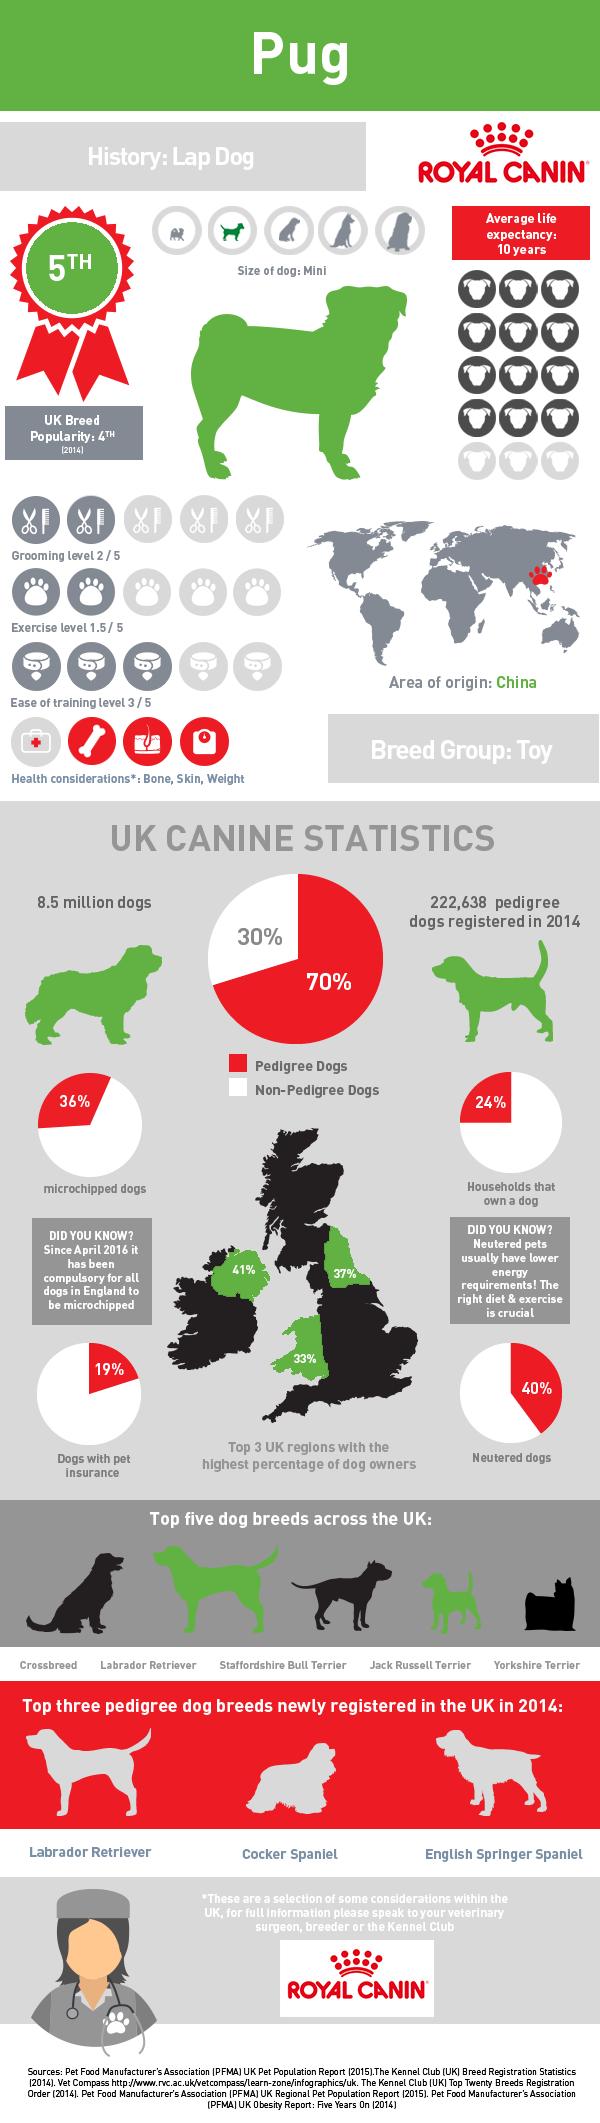 infographic-pug